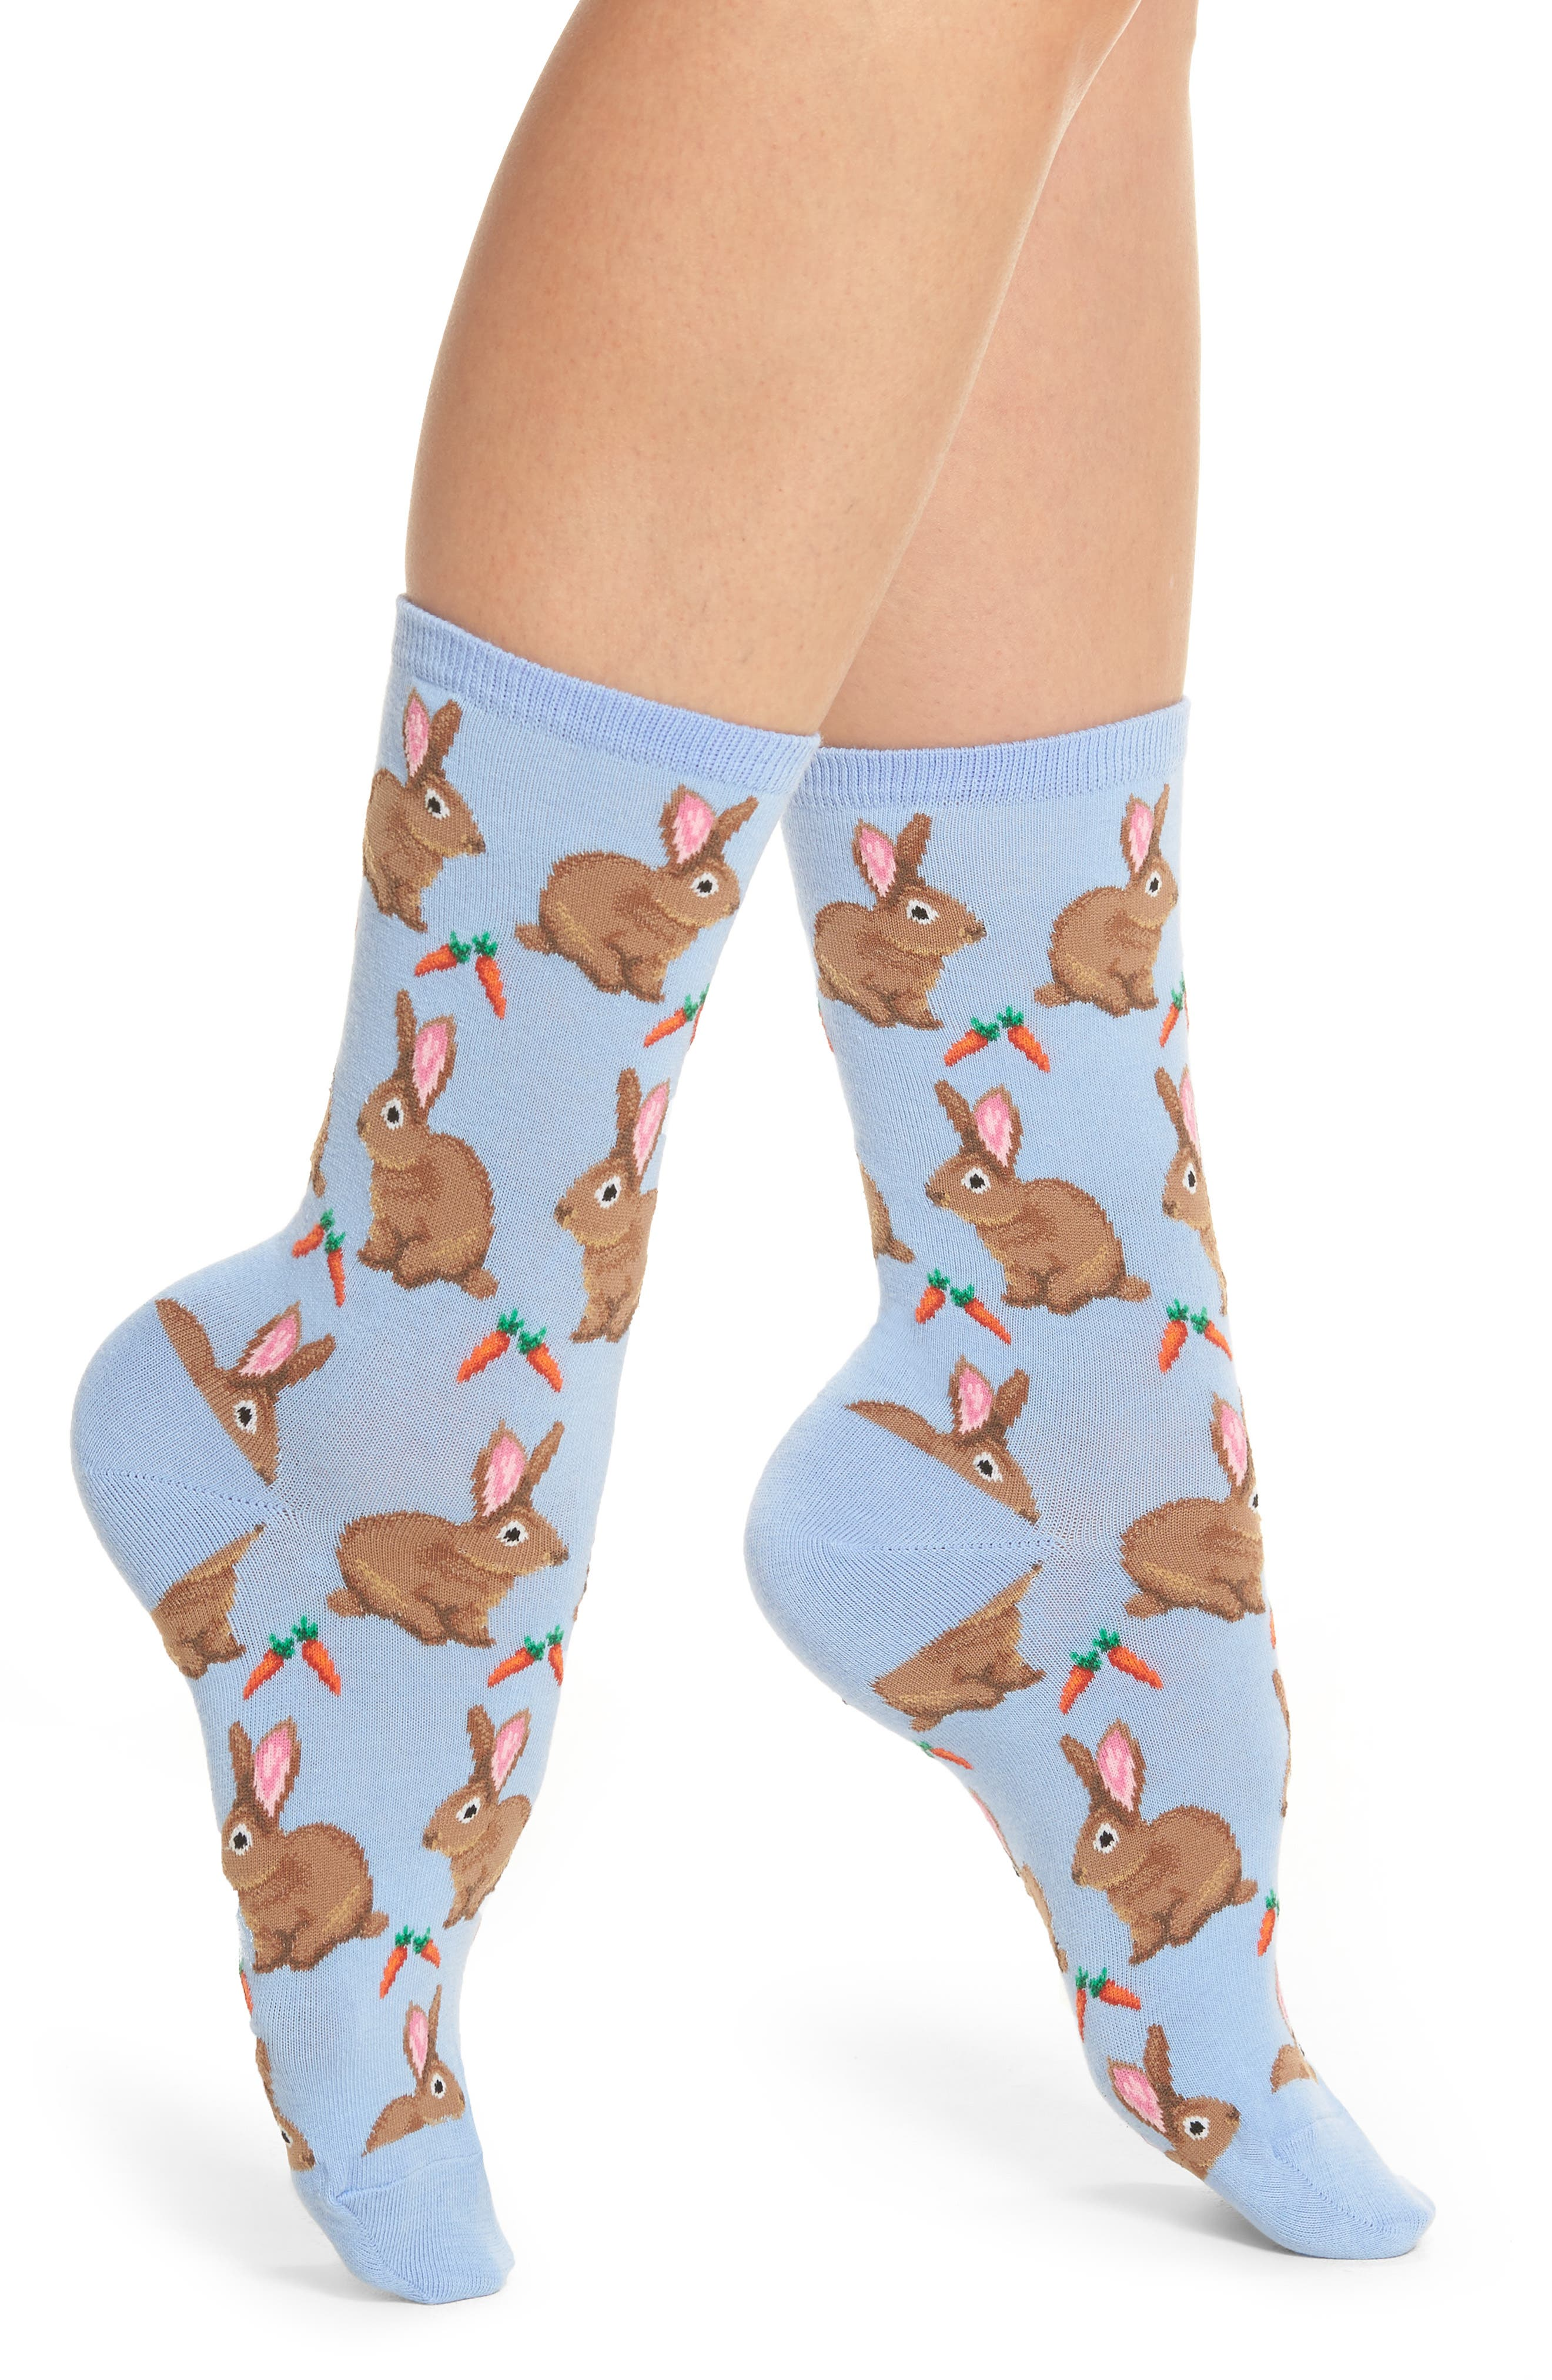 Alternate Image 1 Selected - Hot Sox Bunnies Crew Socks